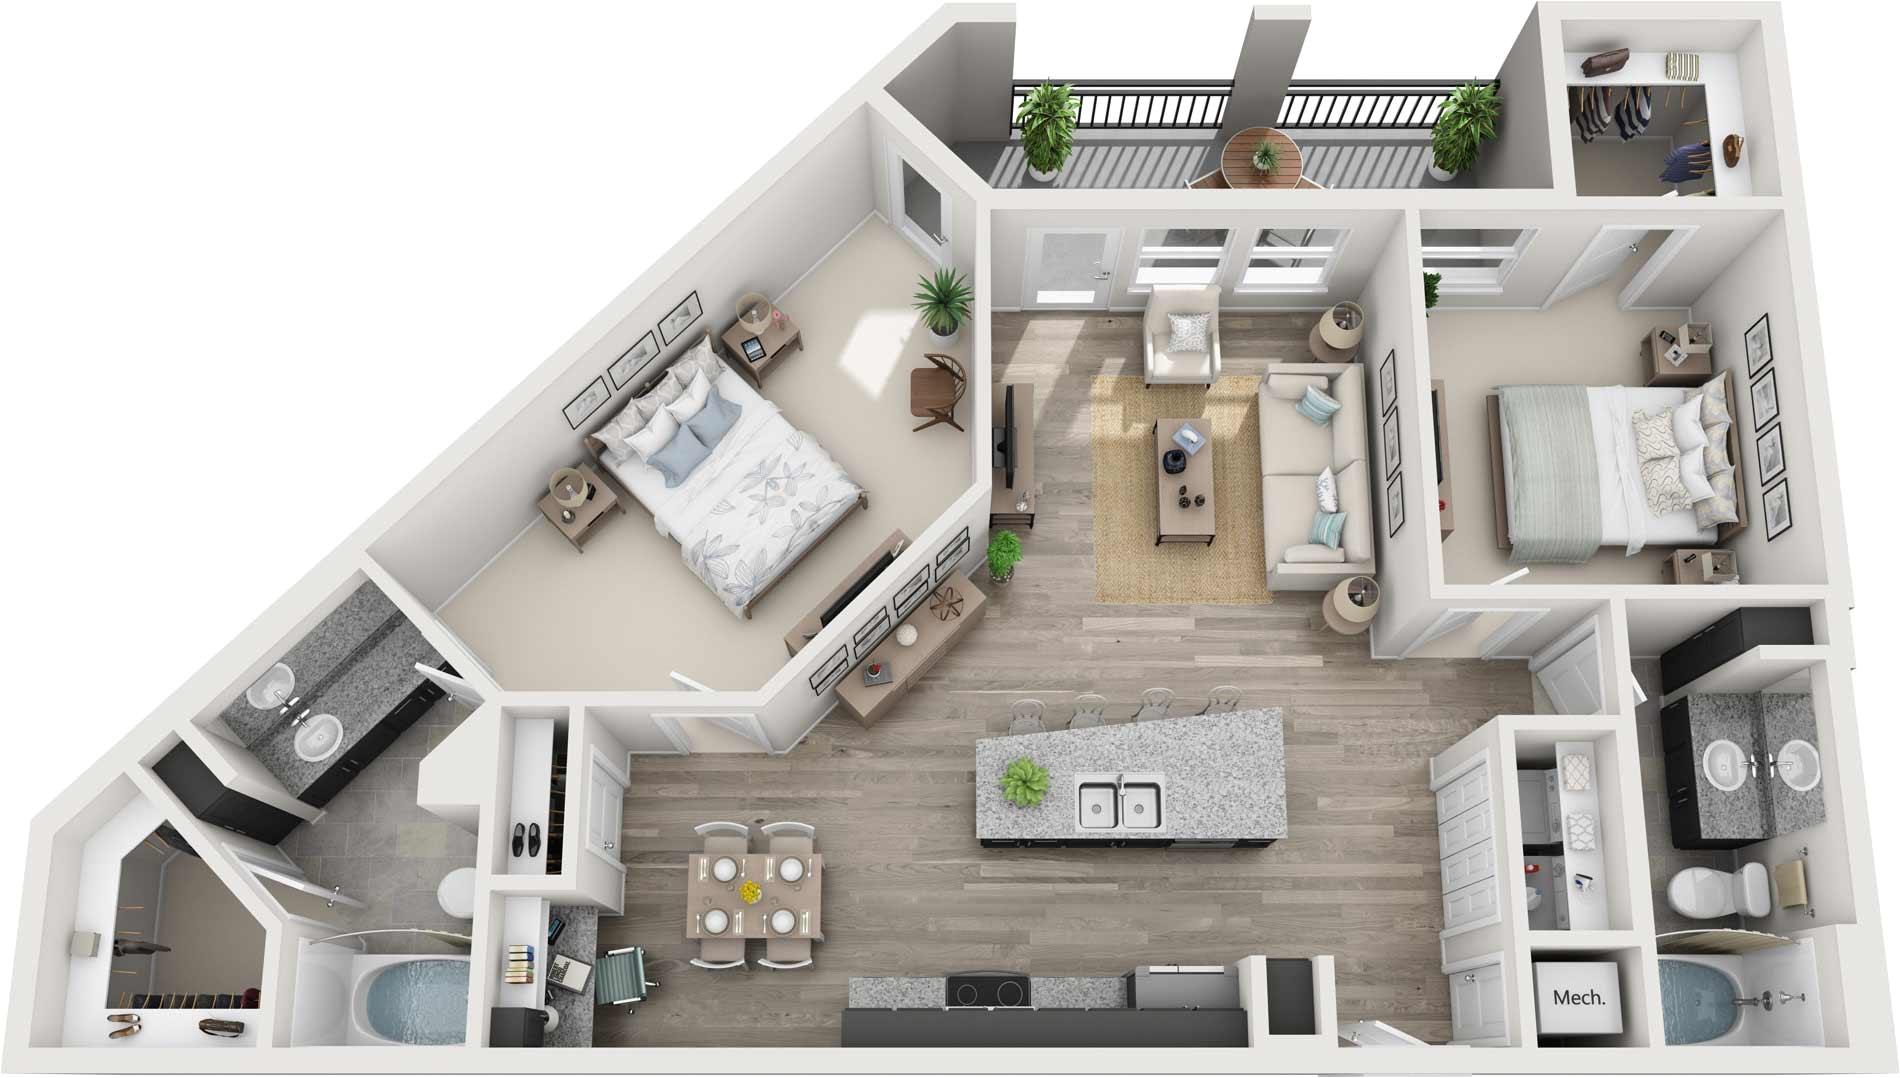 One Bedroom Student Apartments Tampa Fl Elliston 23 Luxury Pet Friendly Apartments In Nashville Tn the